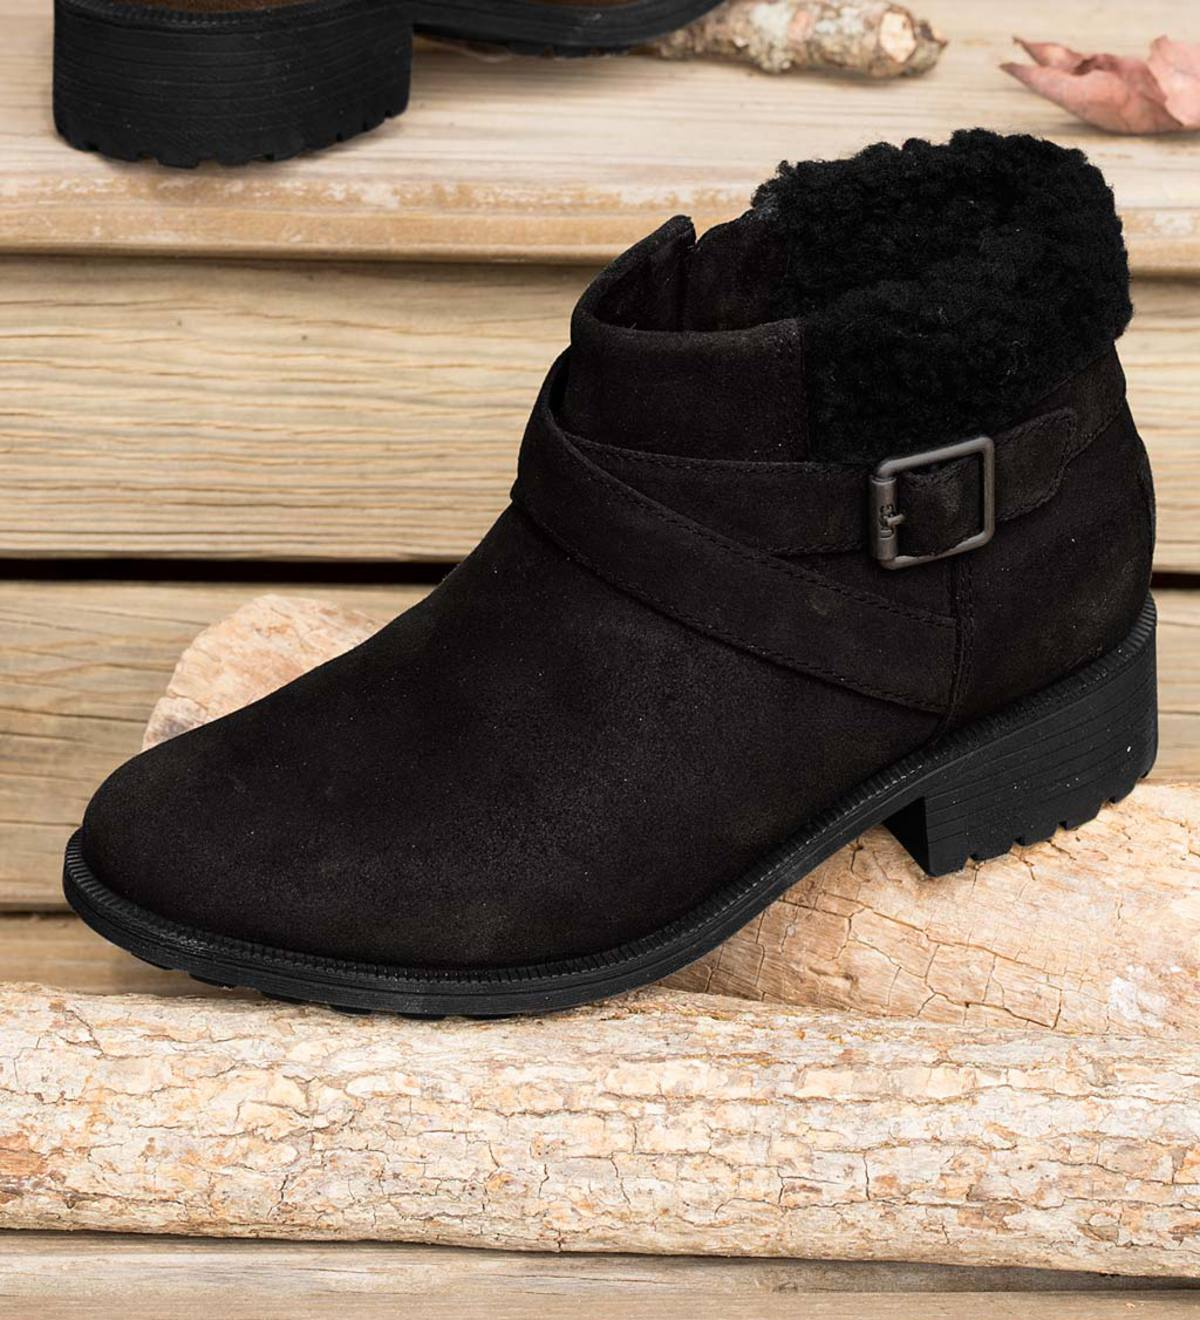 UGG Benson Boot - Black - Size 6